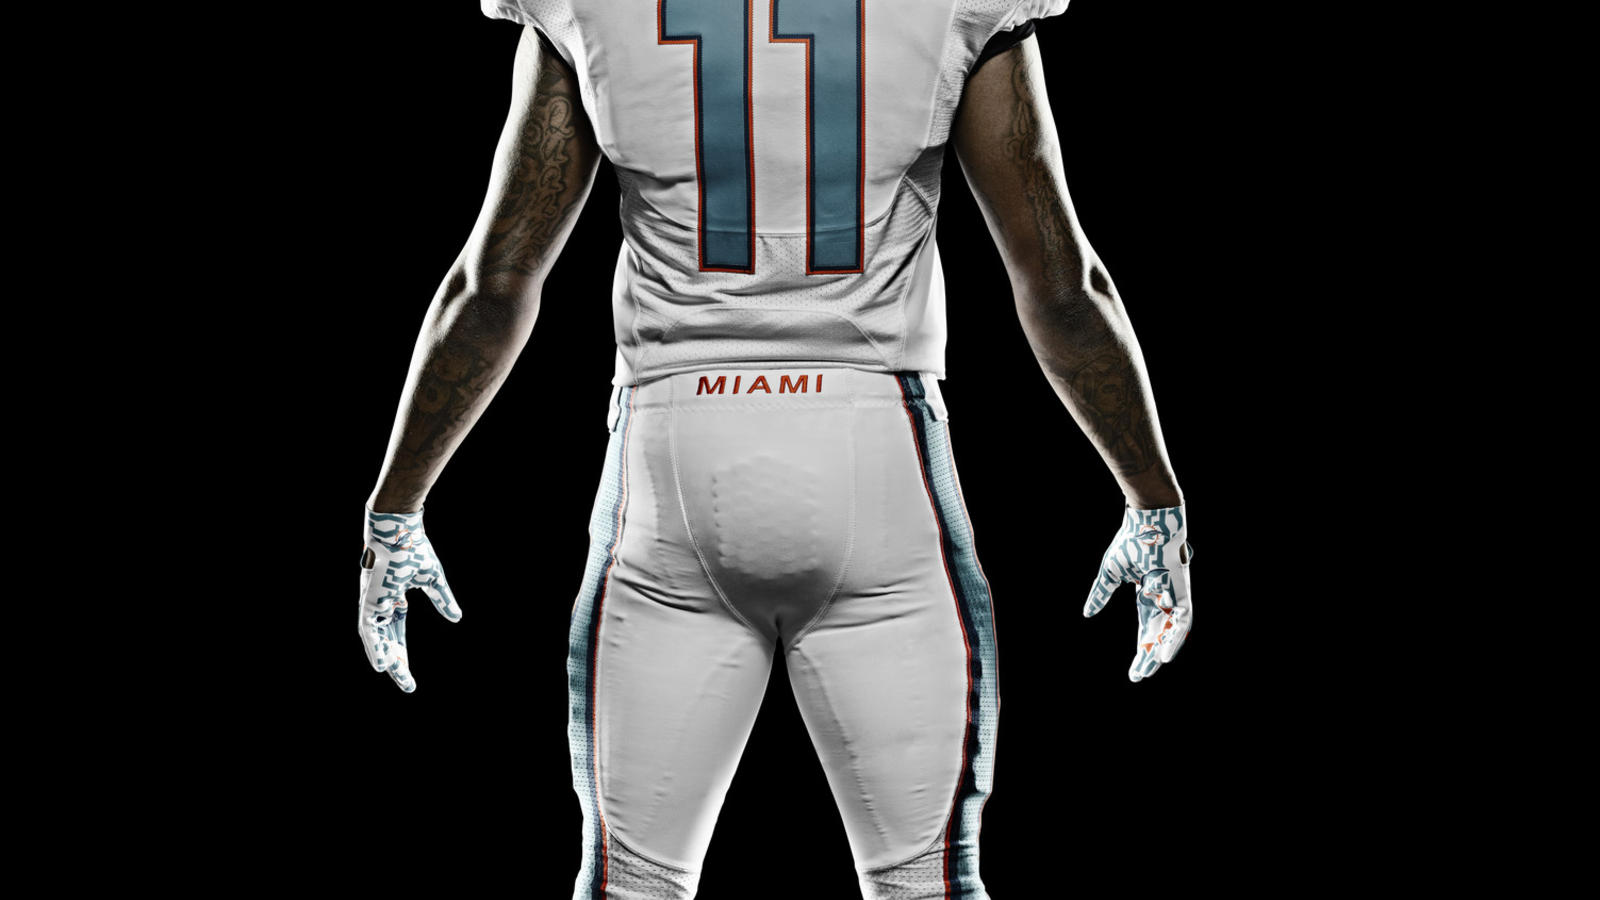 Wallace-Miami-Nike-Elite-51-Uniform-04_hd_1600.jpg?1366838437